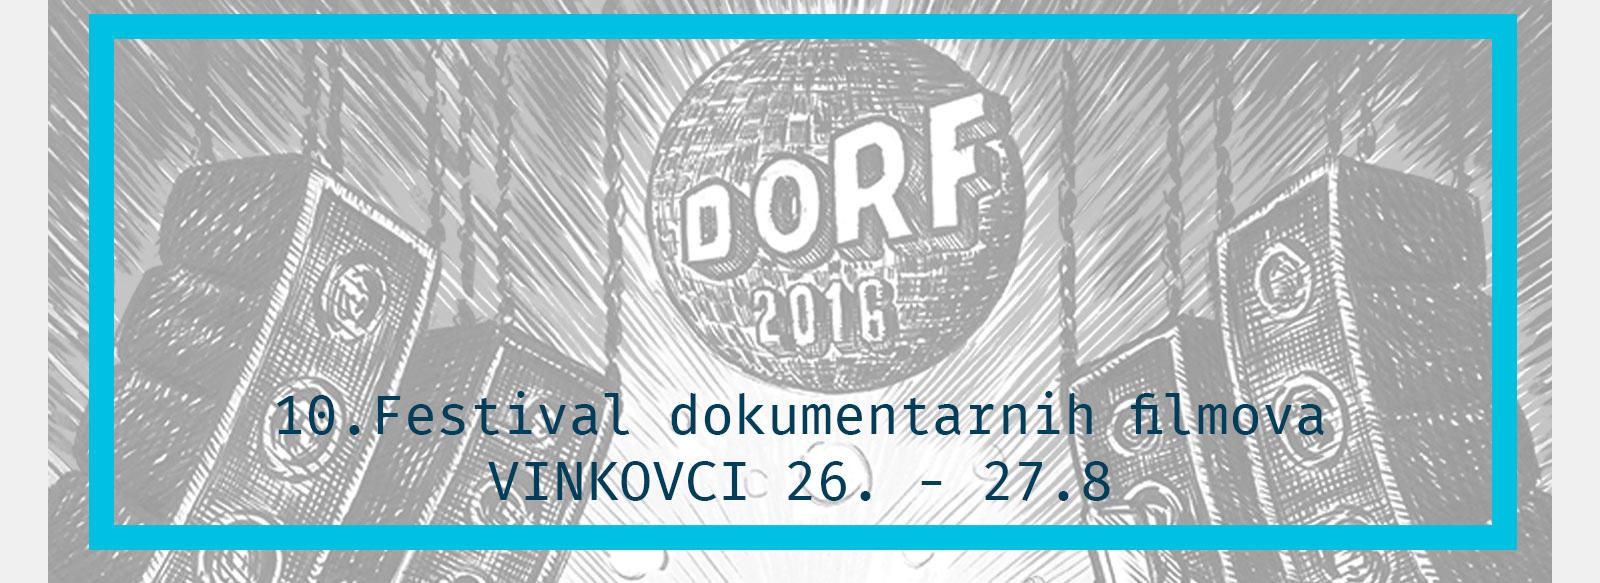 dorf-vinkovci-26-8